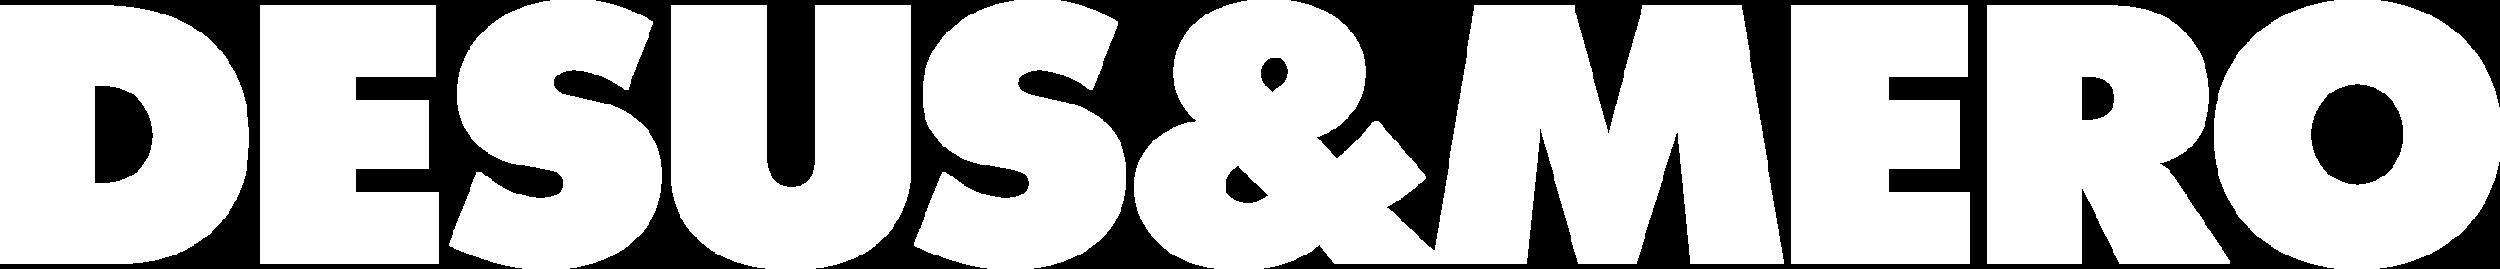 Desus&Mero Logo.png